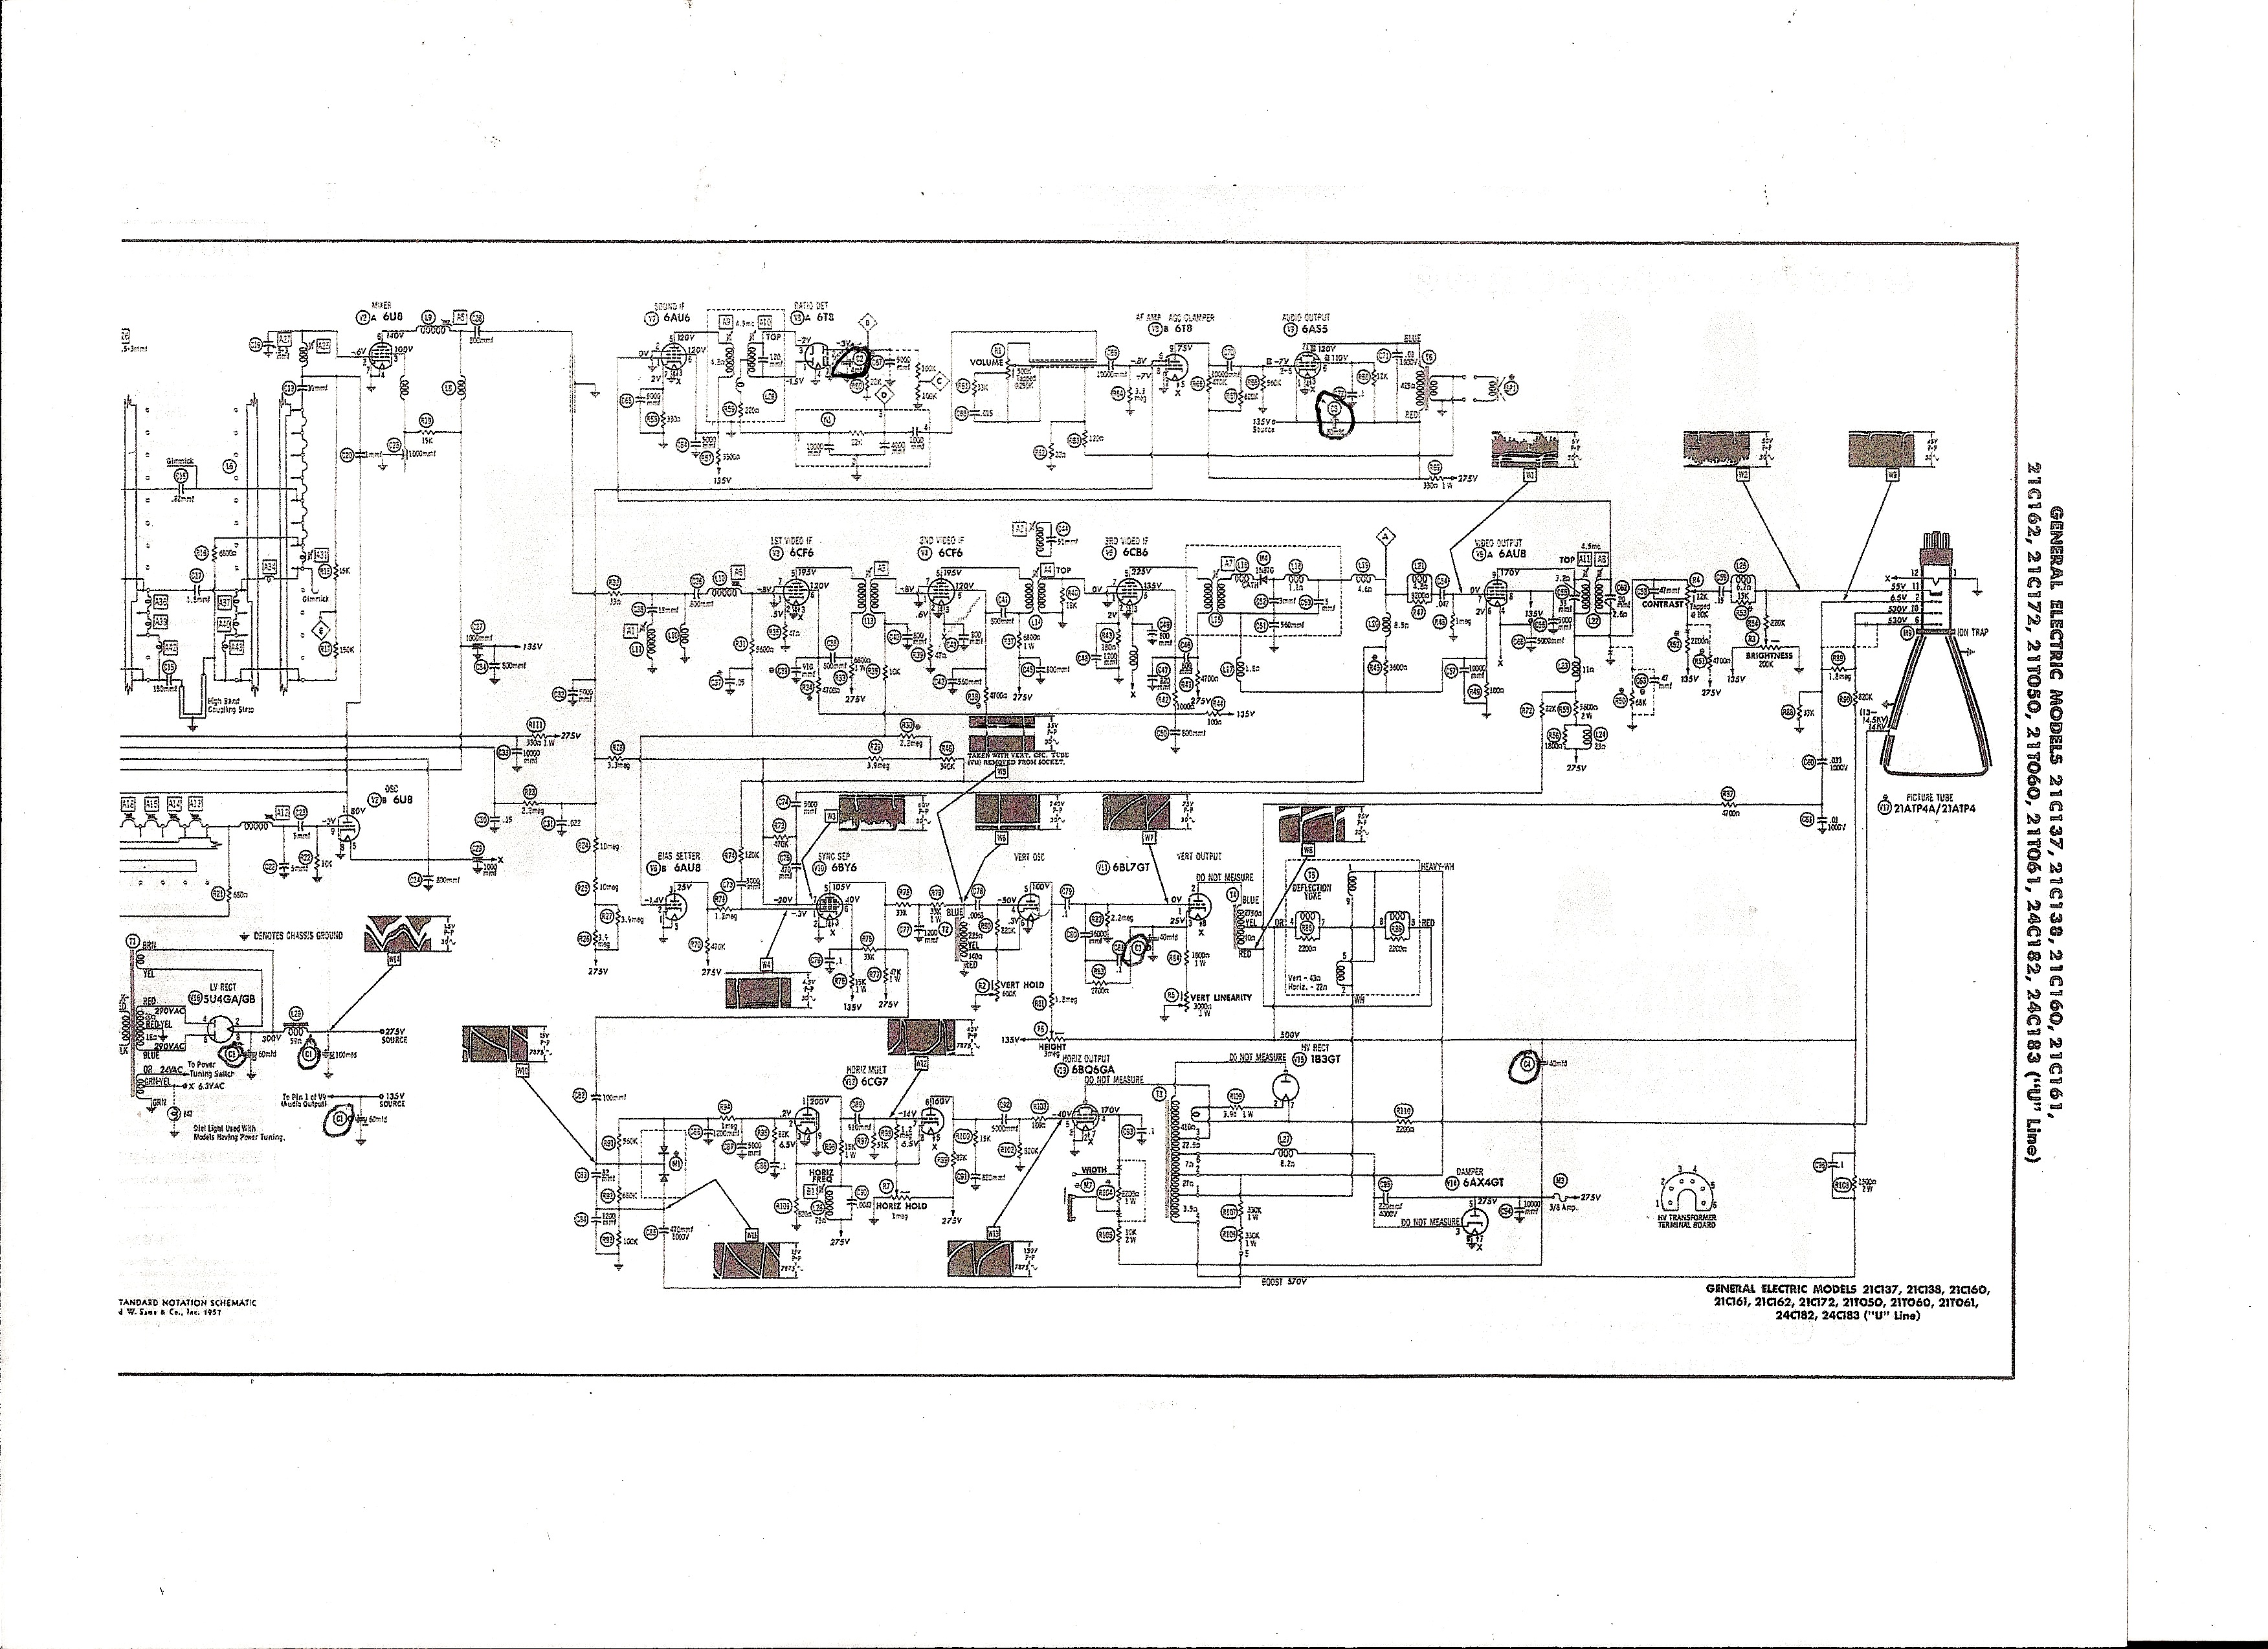 Ge Tv Schematic - Wiring Diagrams Folder Ge Tv Schematic Diagrams on